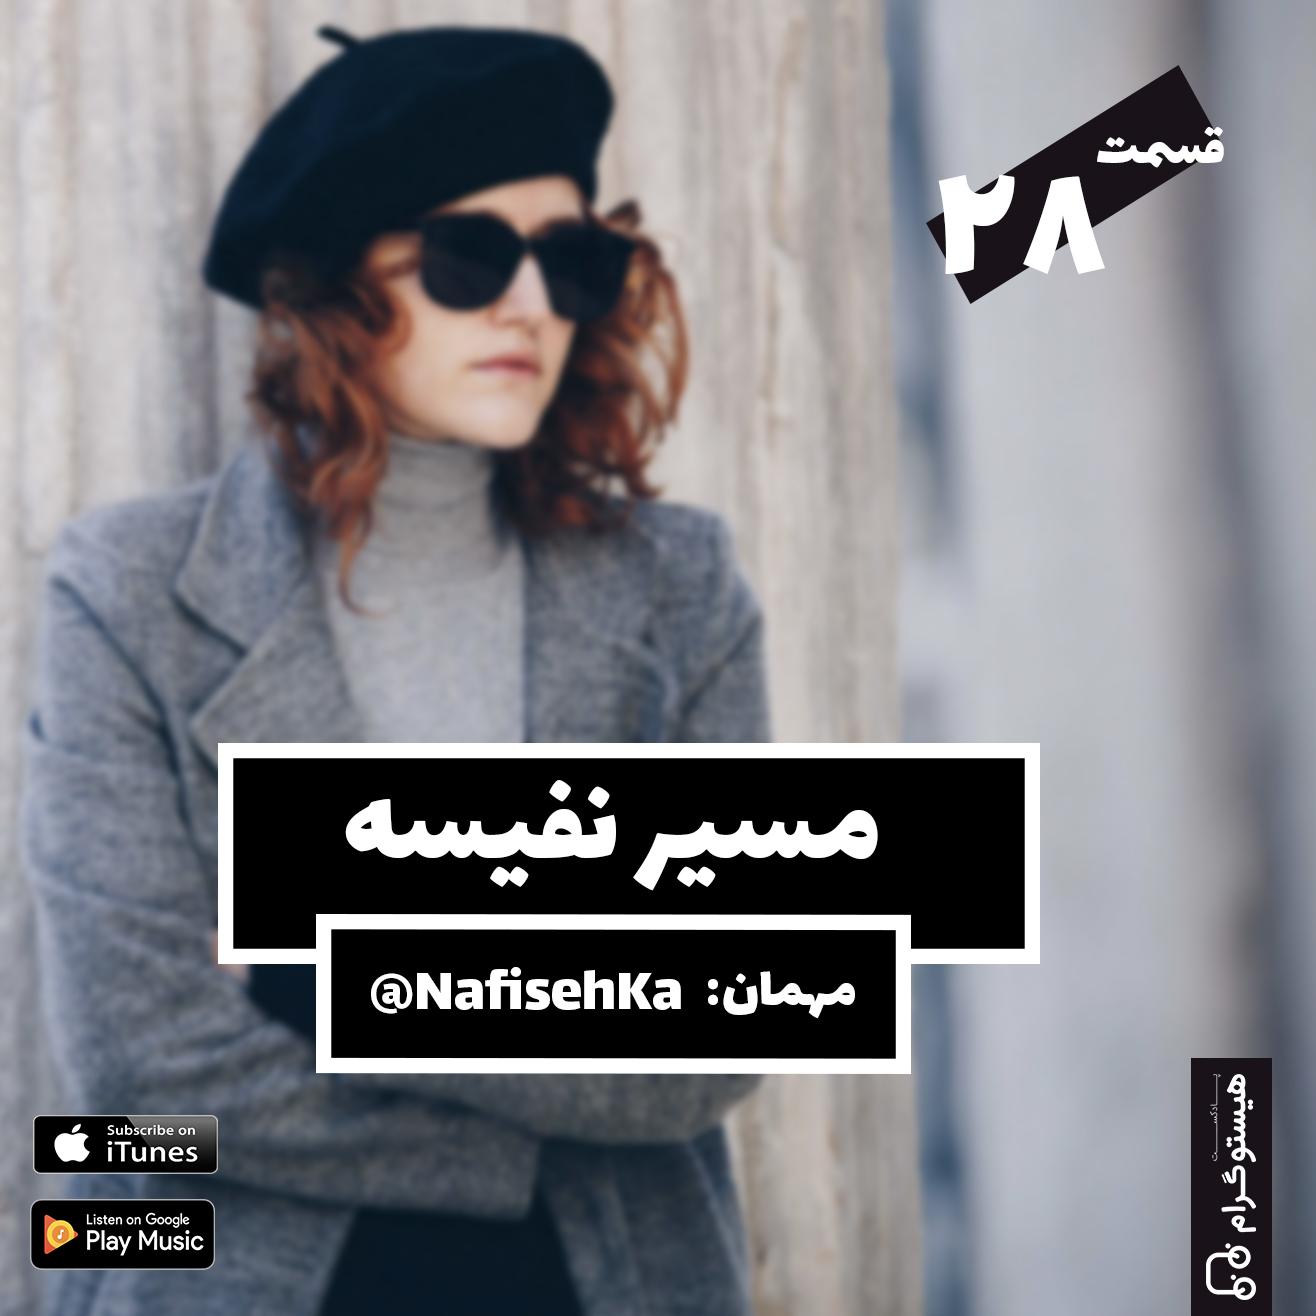 Nafiseh Kaboudvand